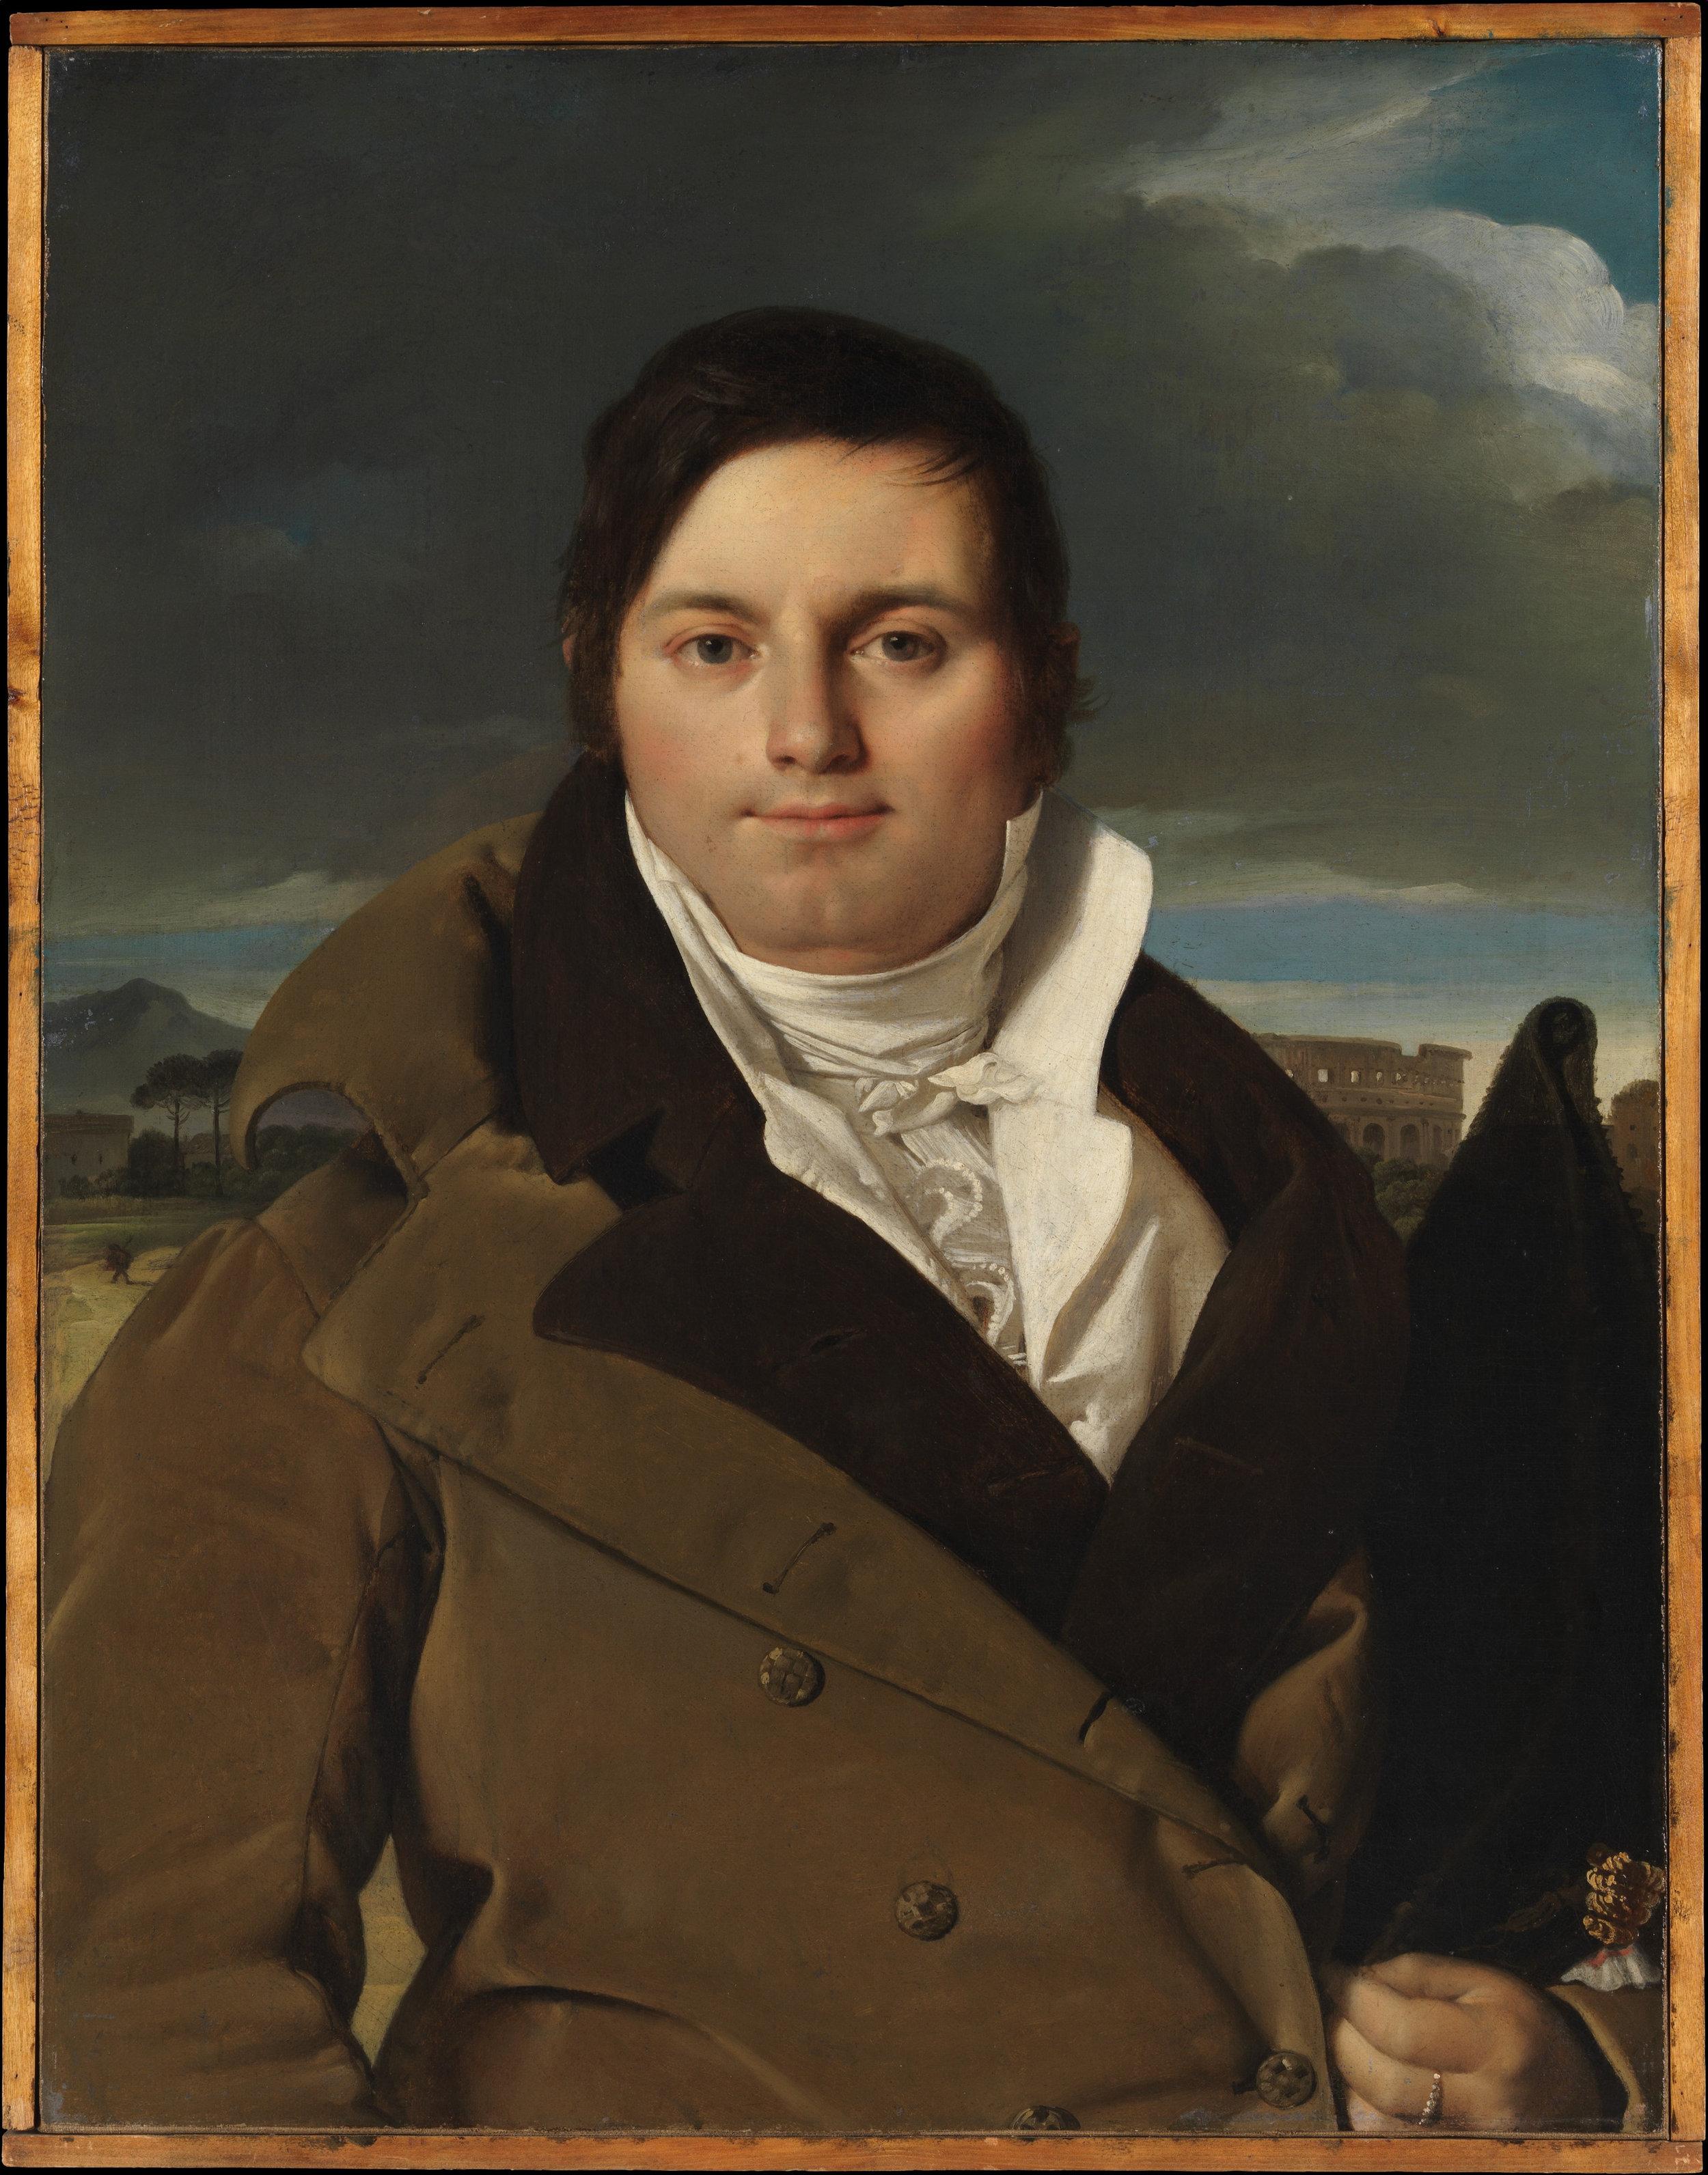 Joseph-Antoine Moltedo by Ingres.jpg